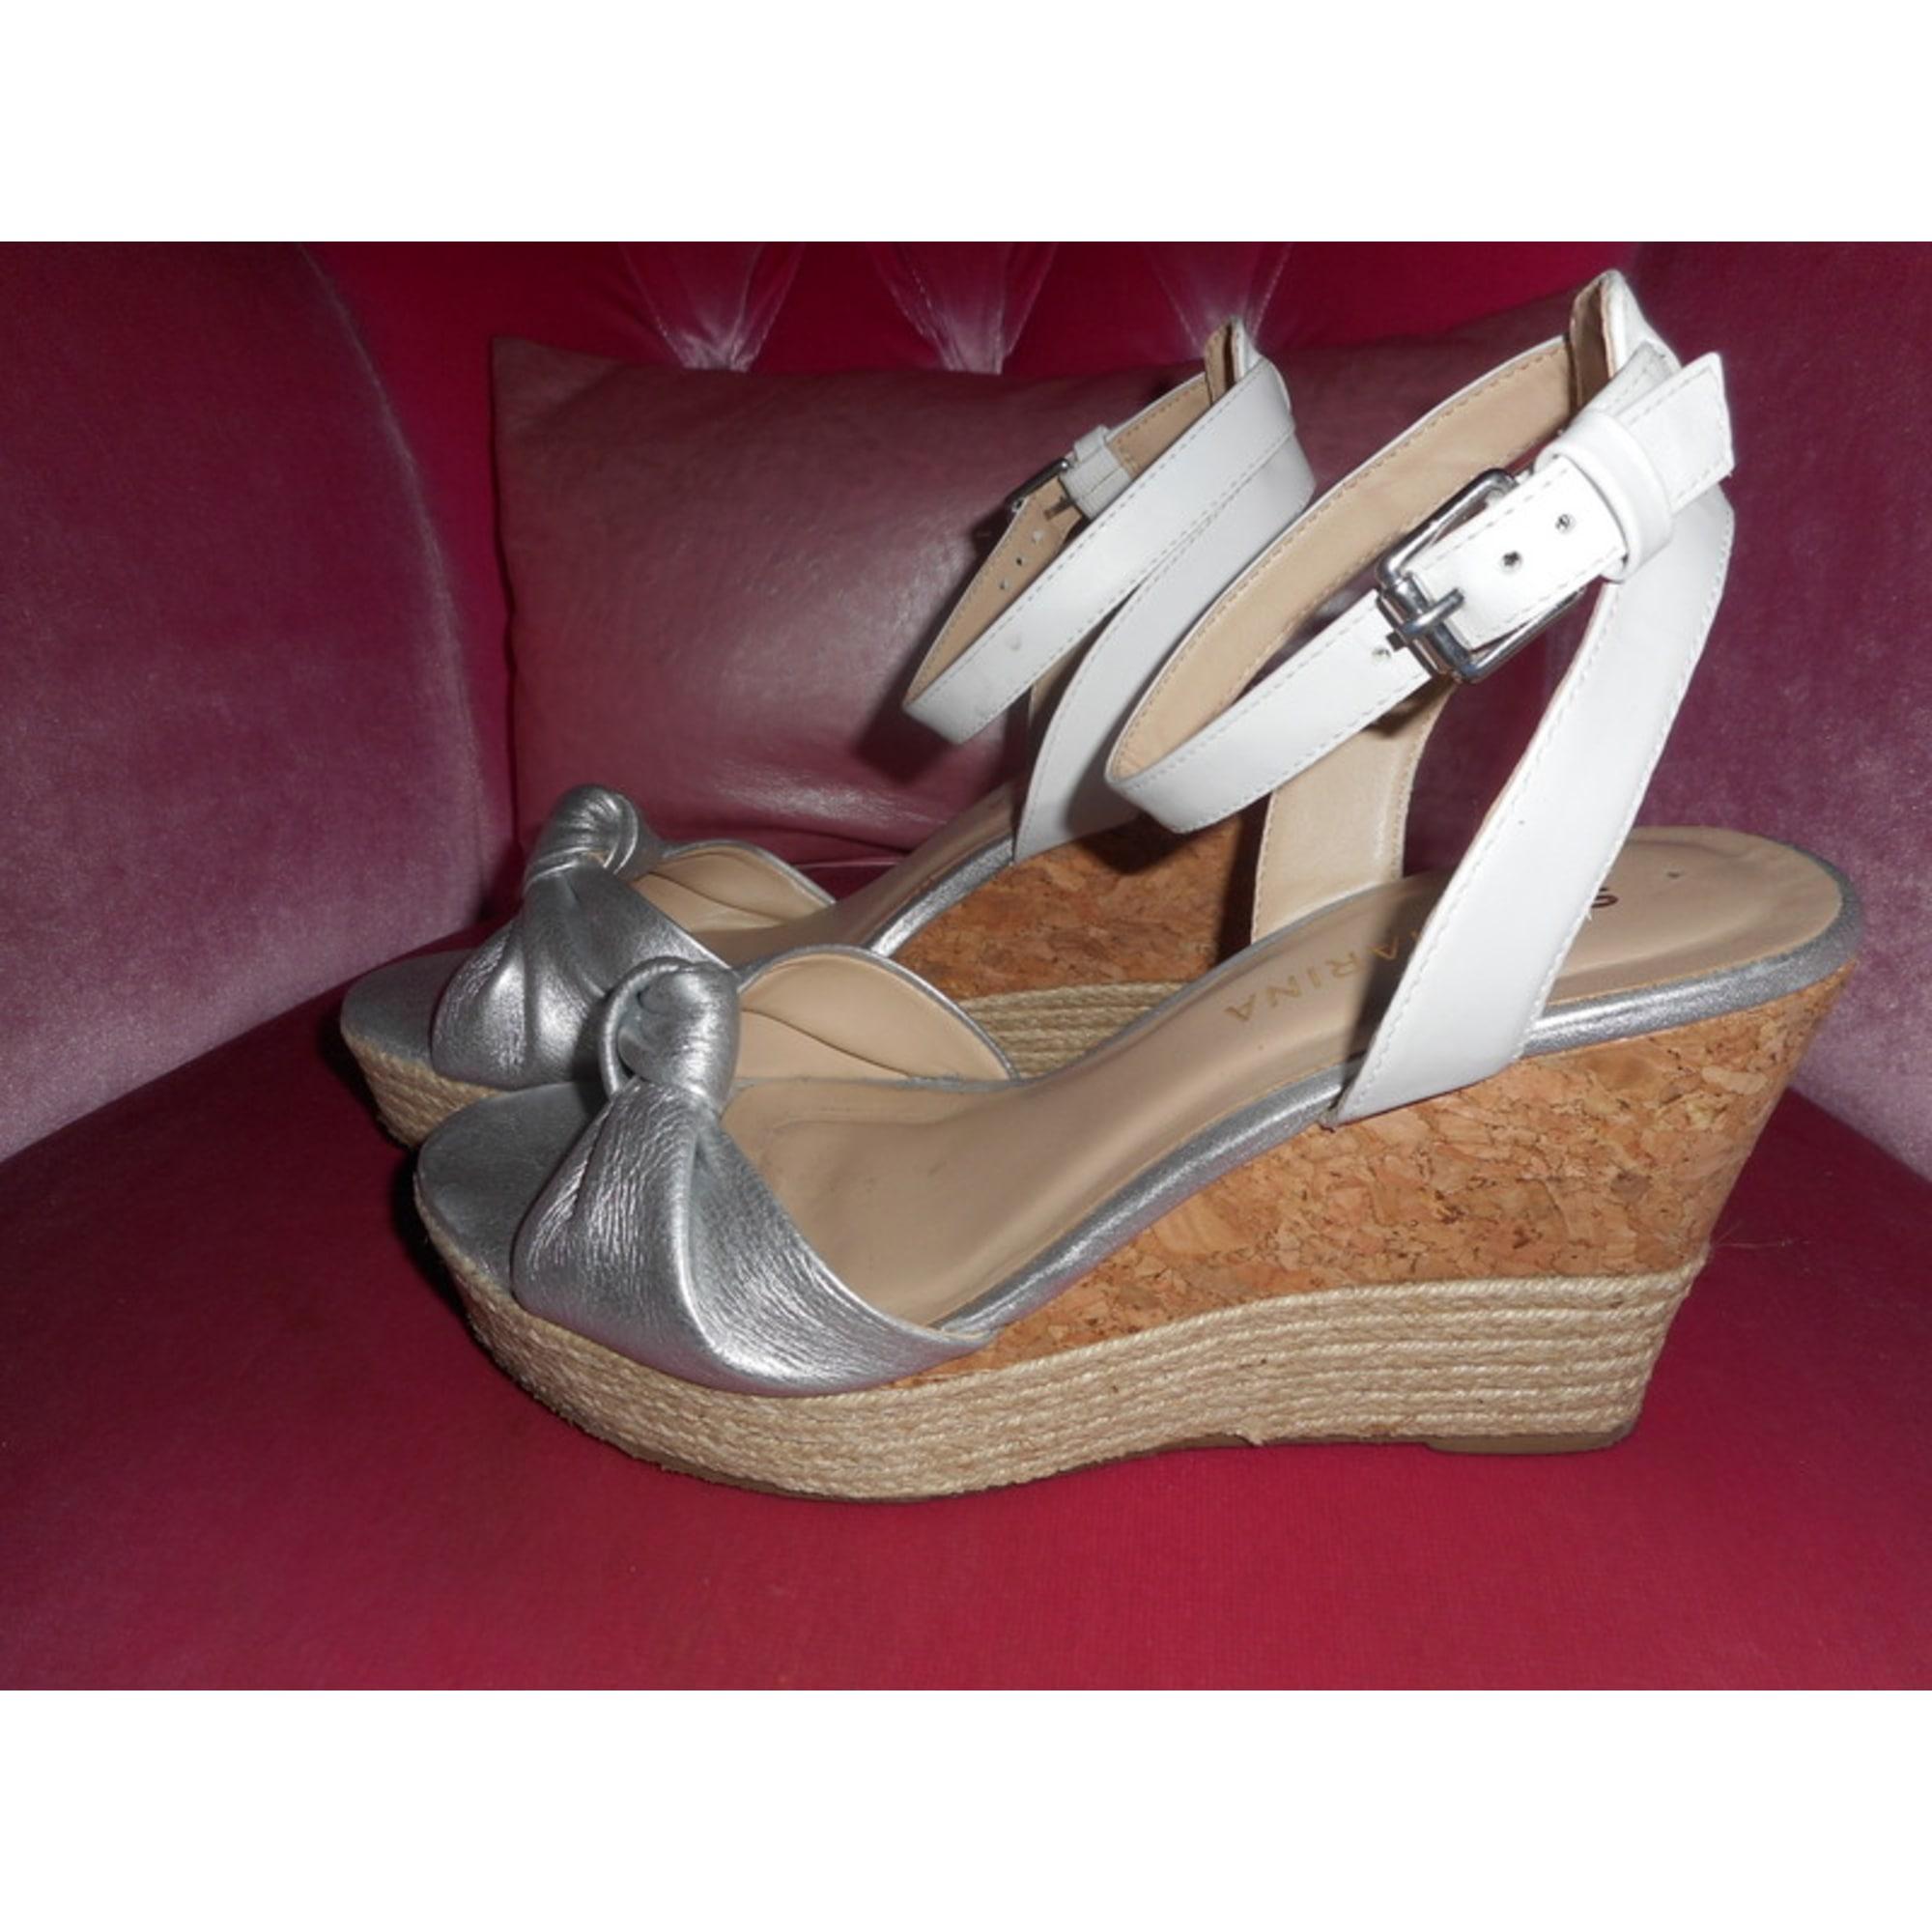 Compensées San Blanc 6412253 Sandales Marina 39 N0w8vnm